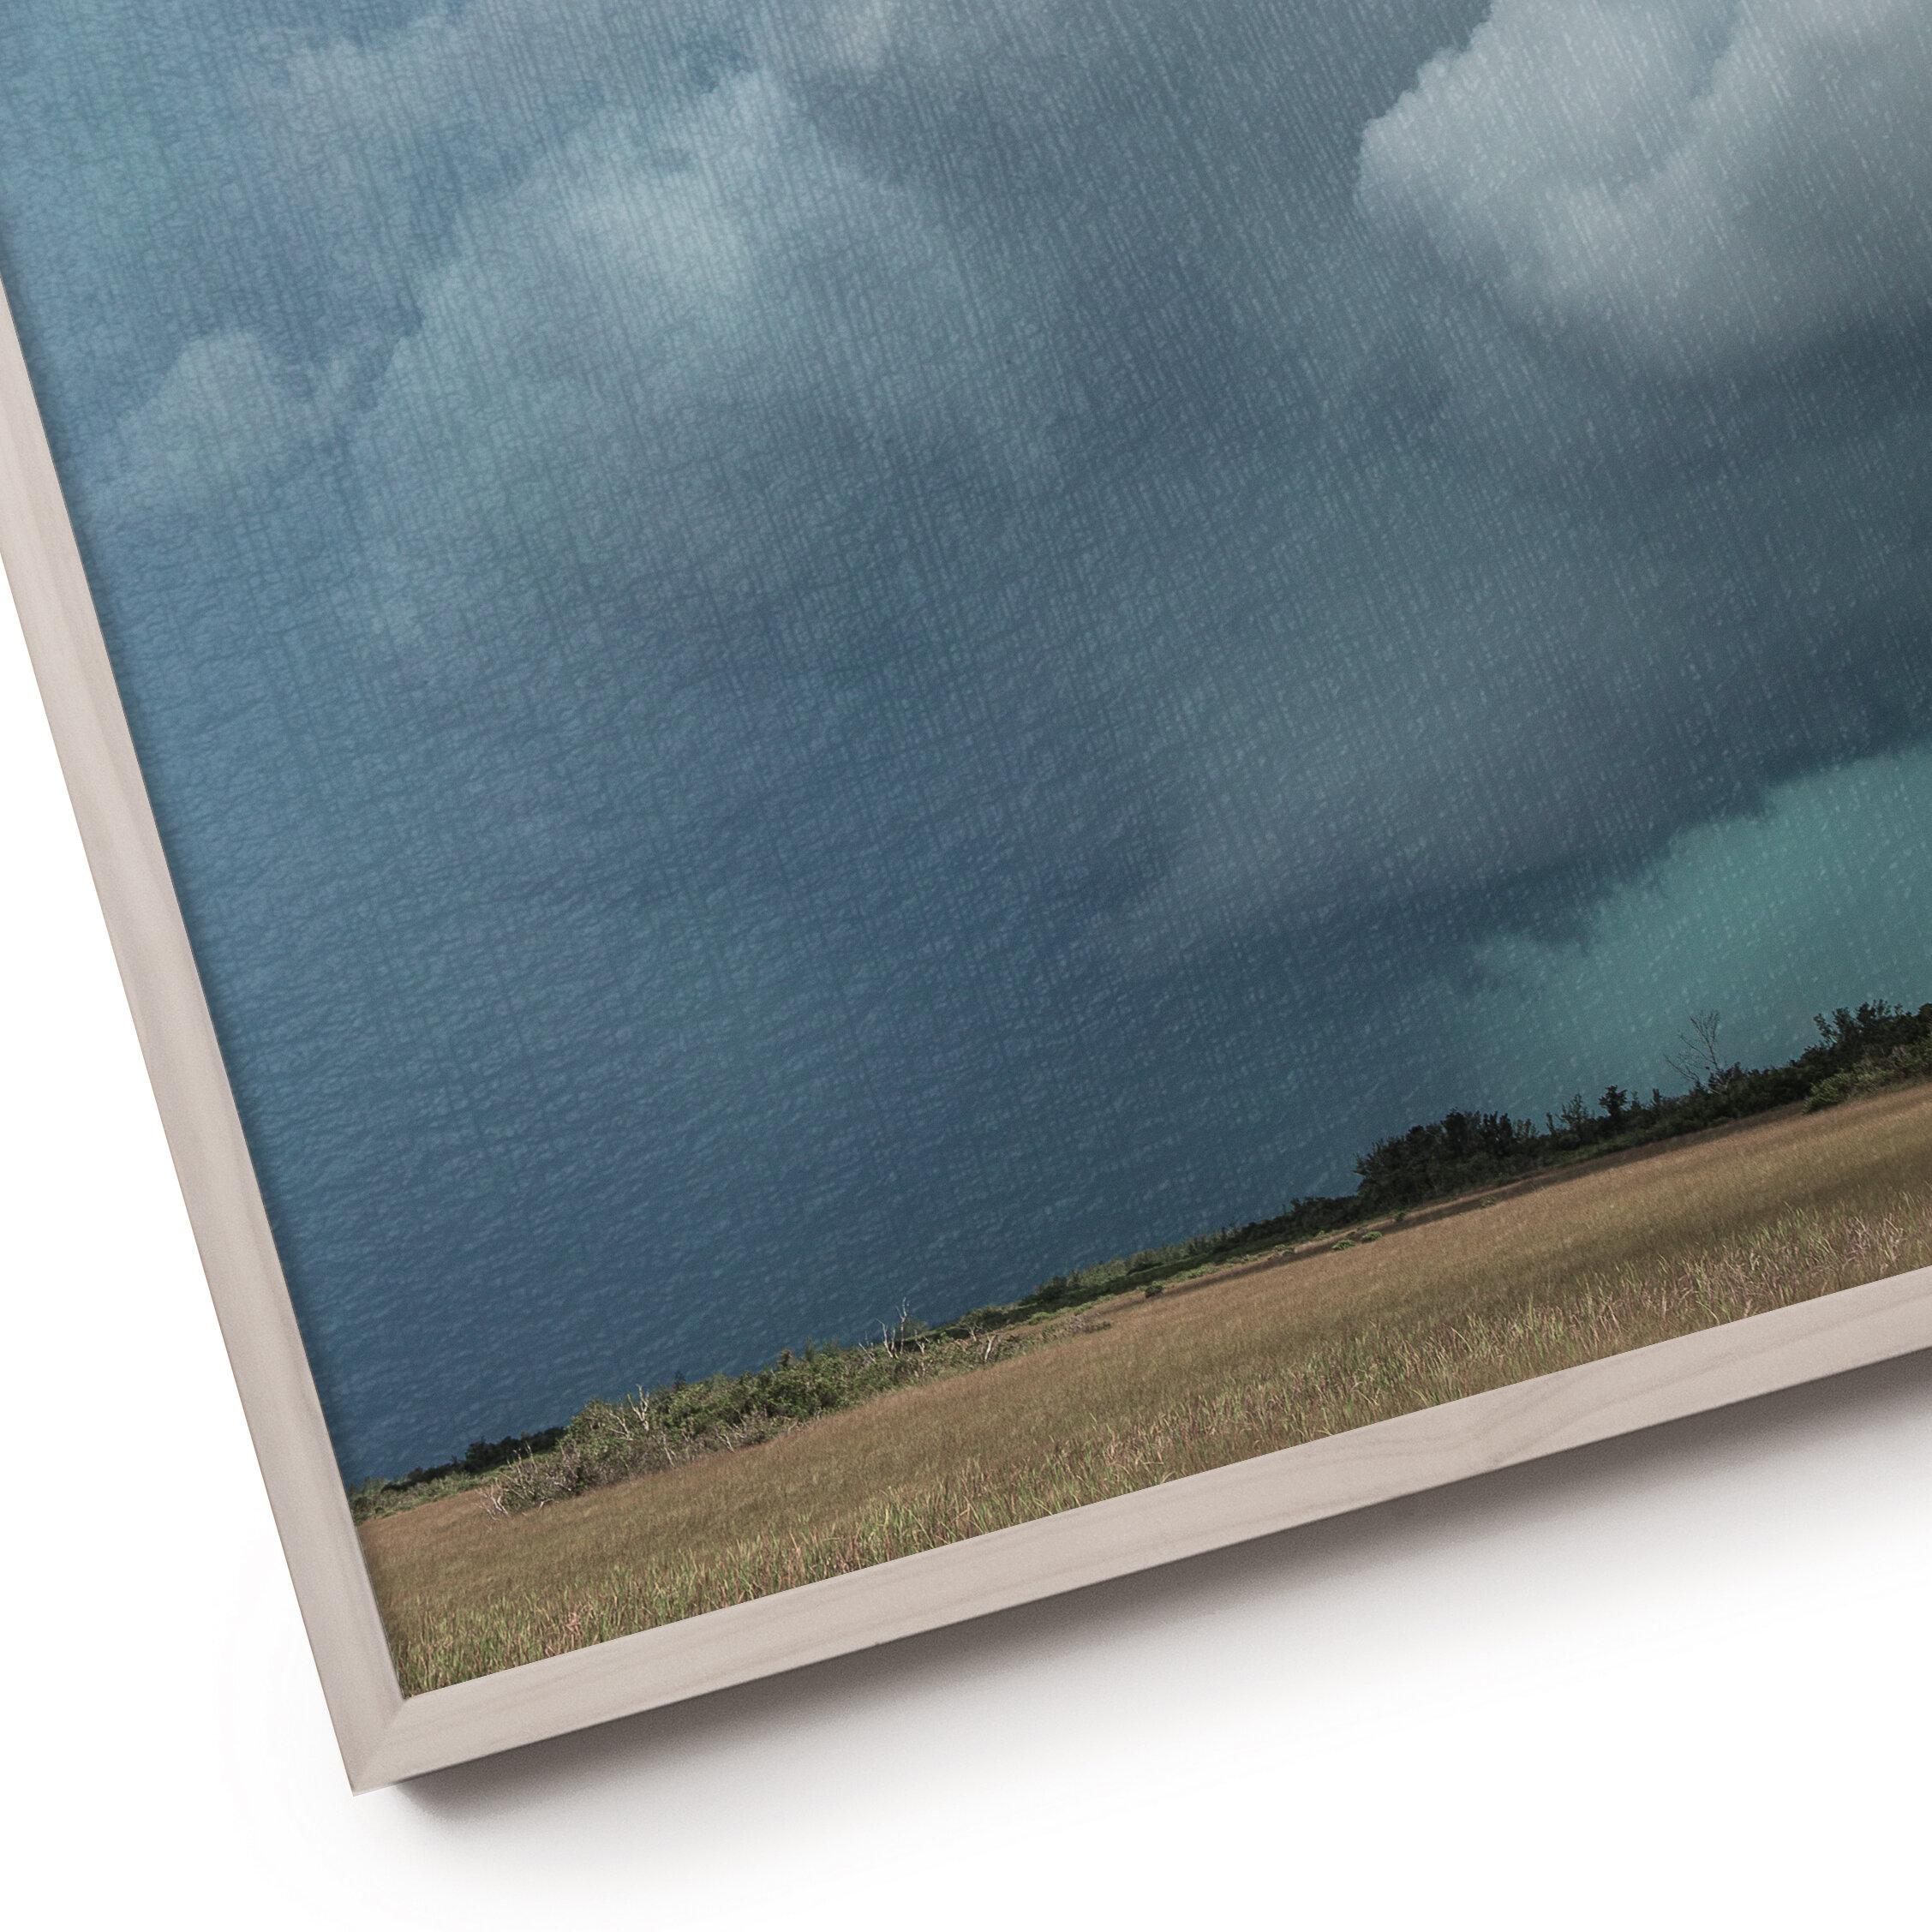 © David Gary Lloyd - Strength In The Wind - IMG_0434 Zoom.jpg